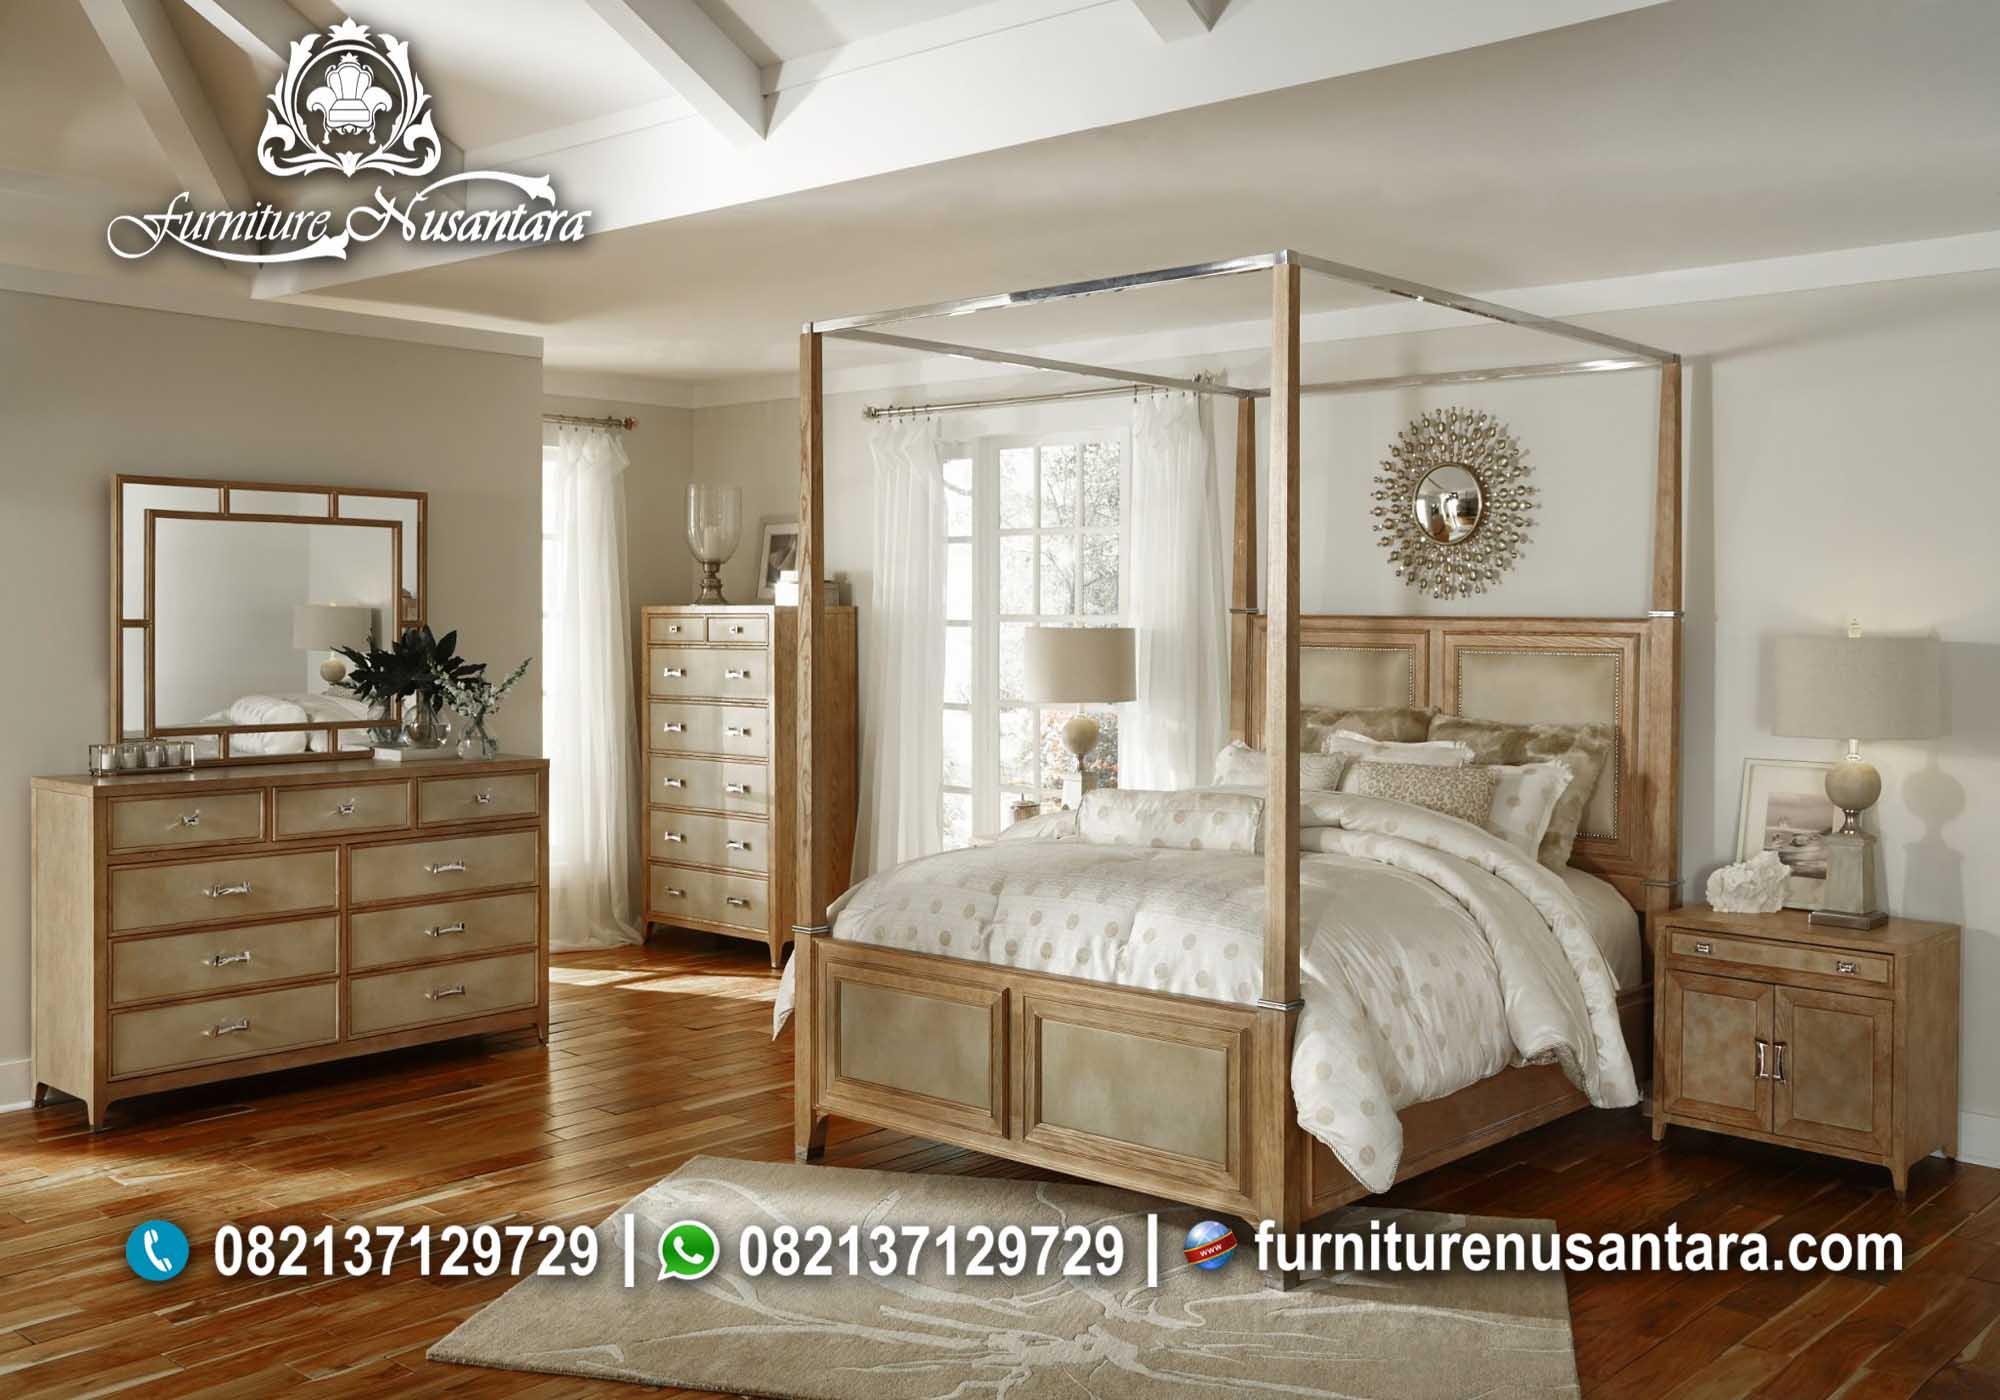 Dekorasi Kamar Ala Eropa KS-45, Furniture Nusantara